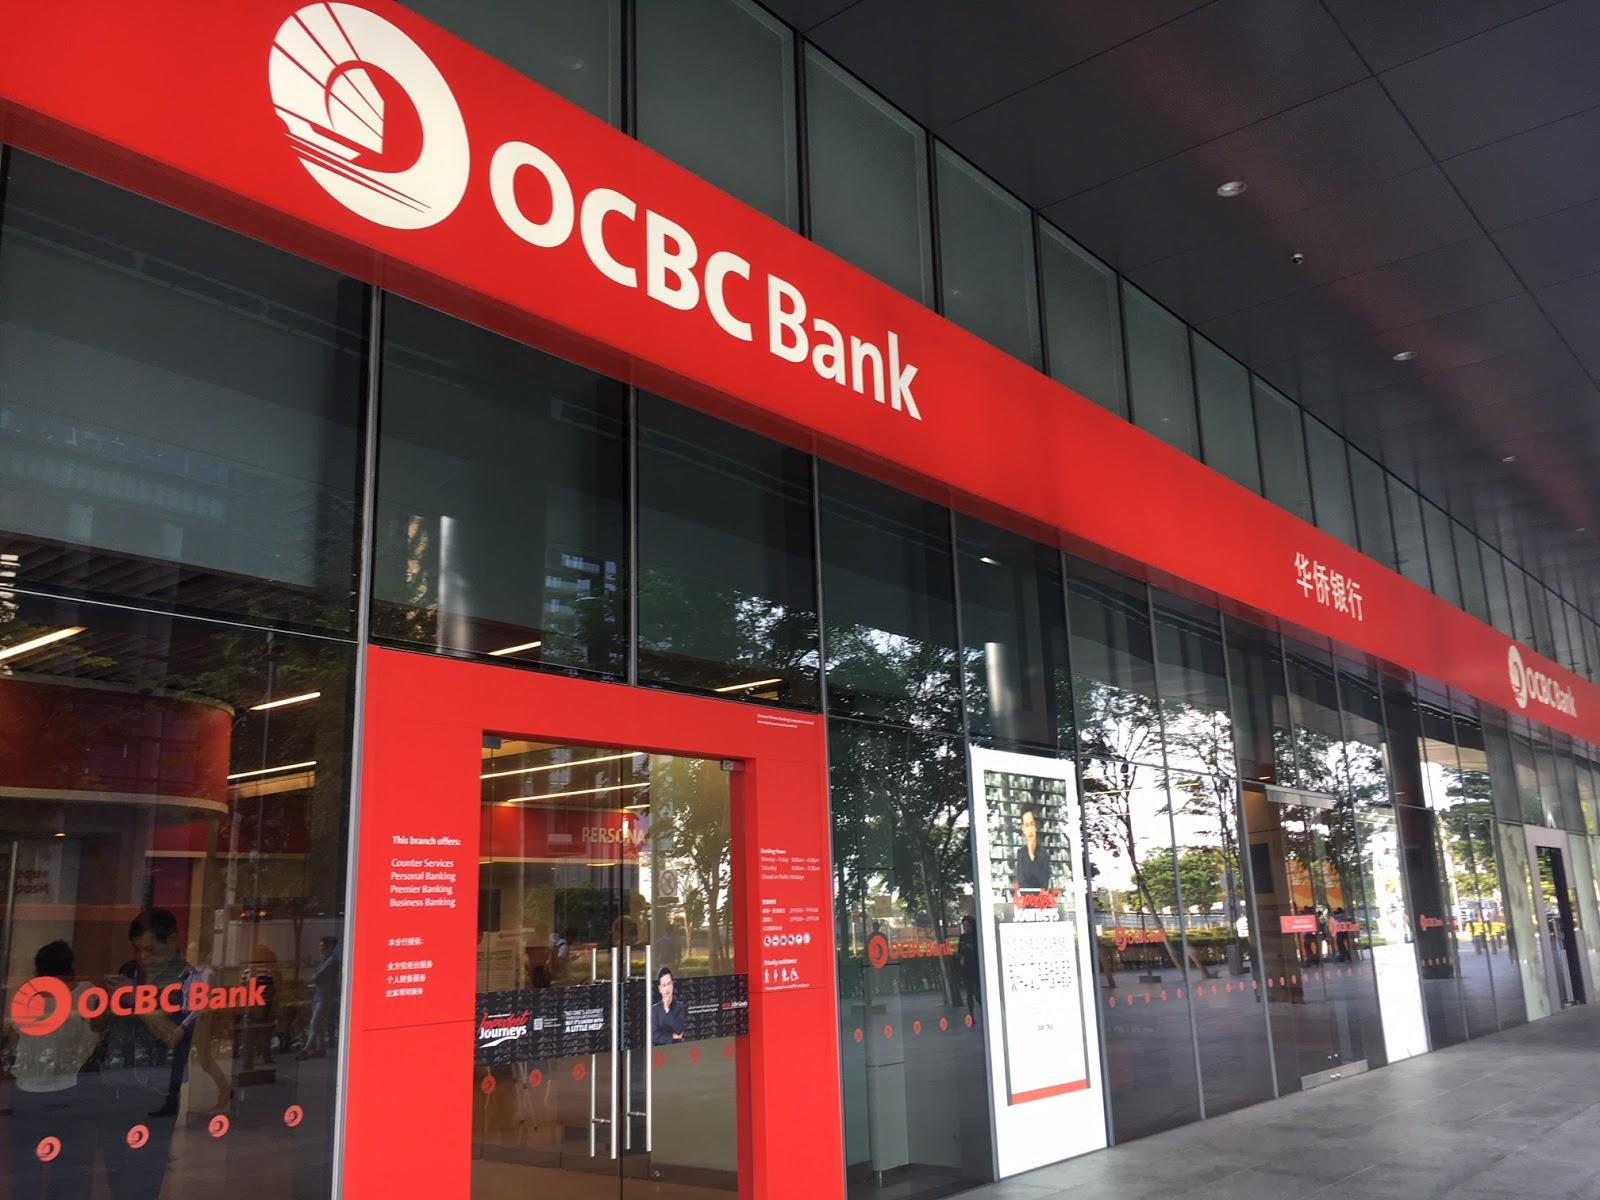 OCBC Bank in Singapore